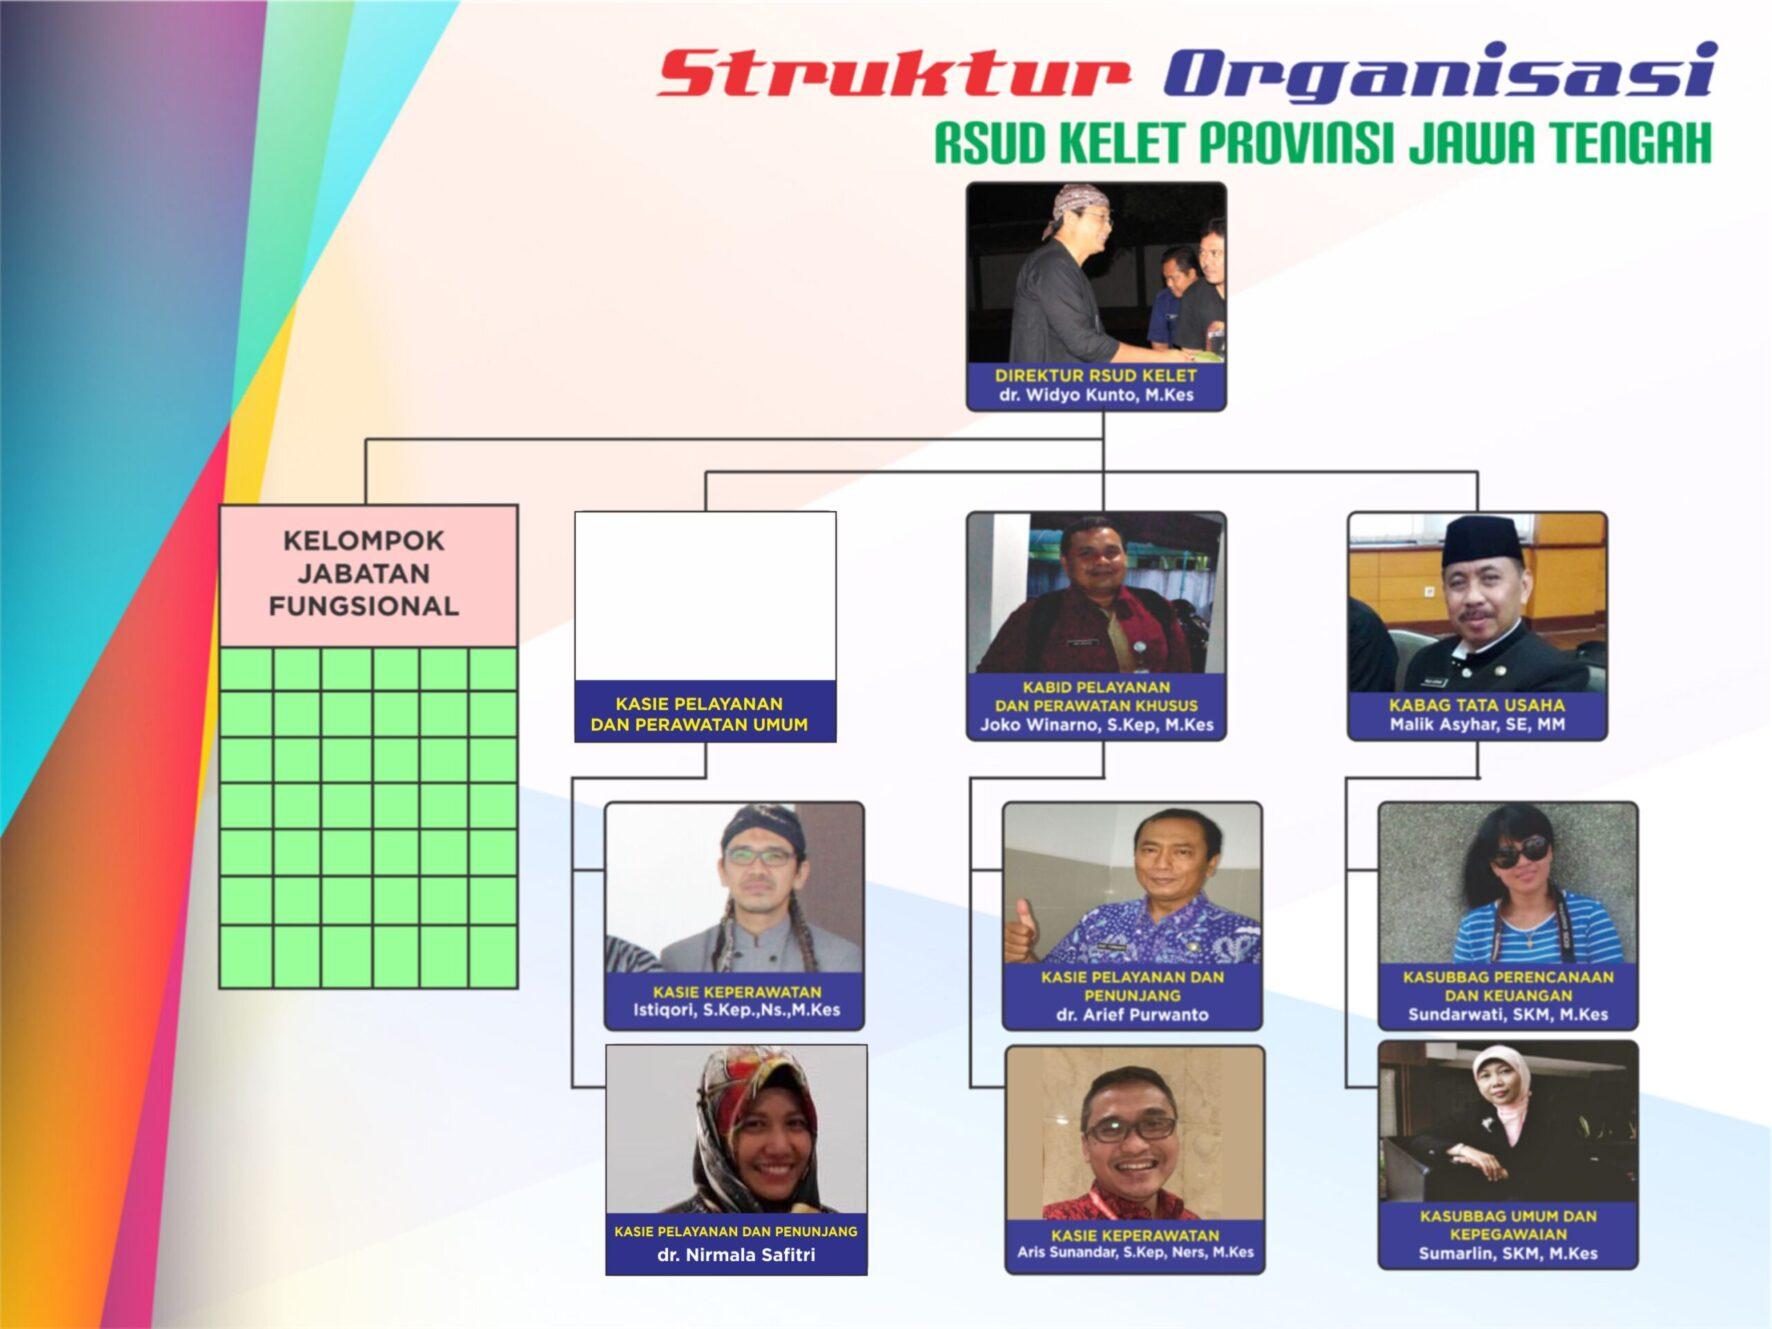 struktur organisasi tahun 2020